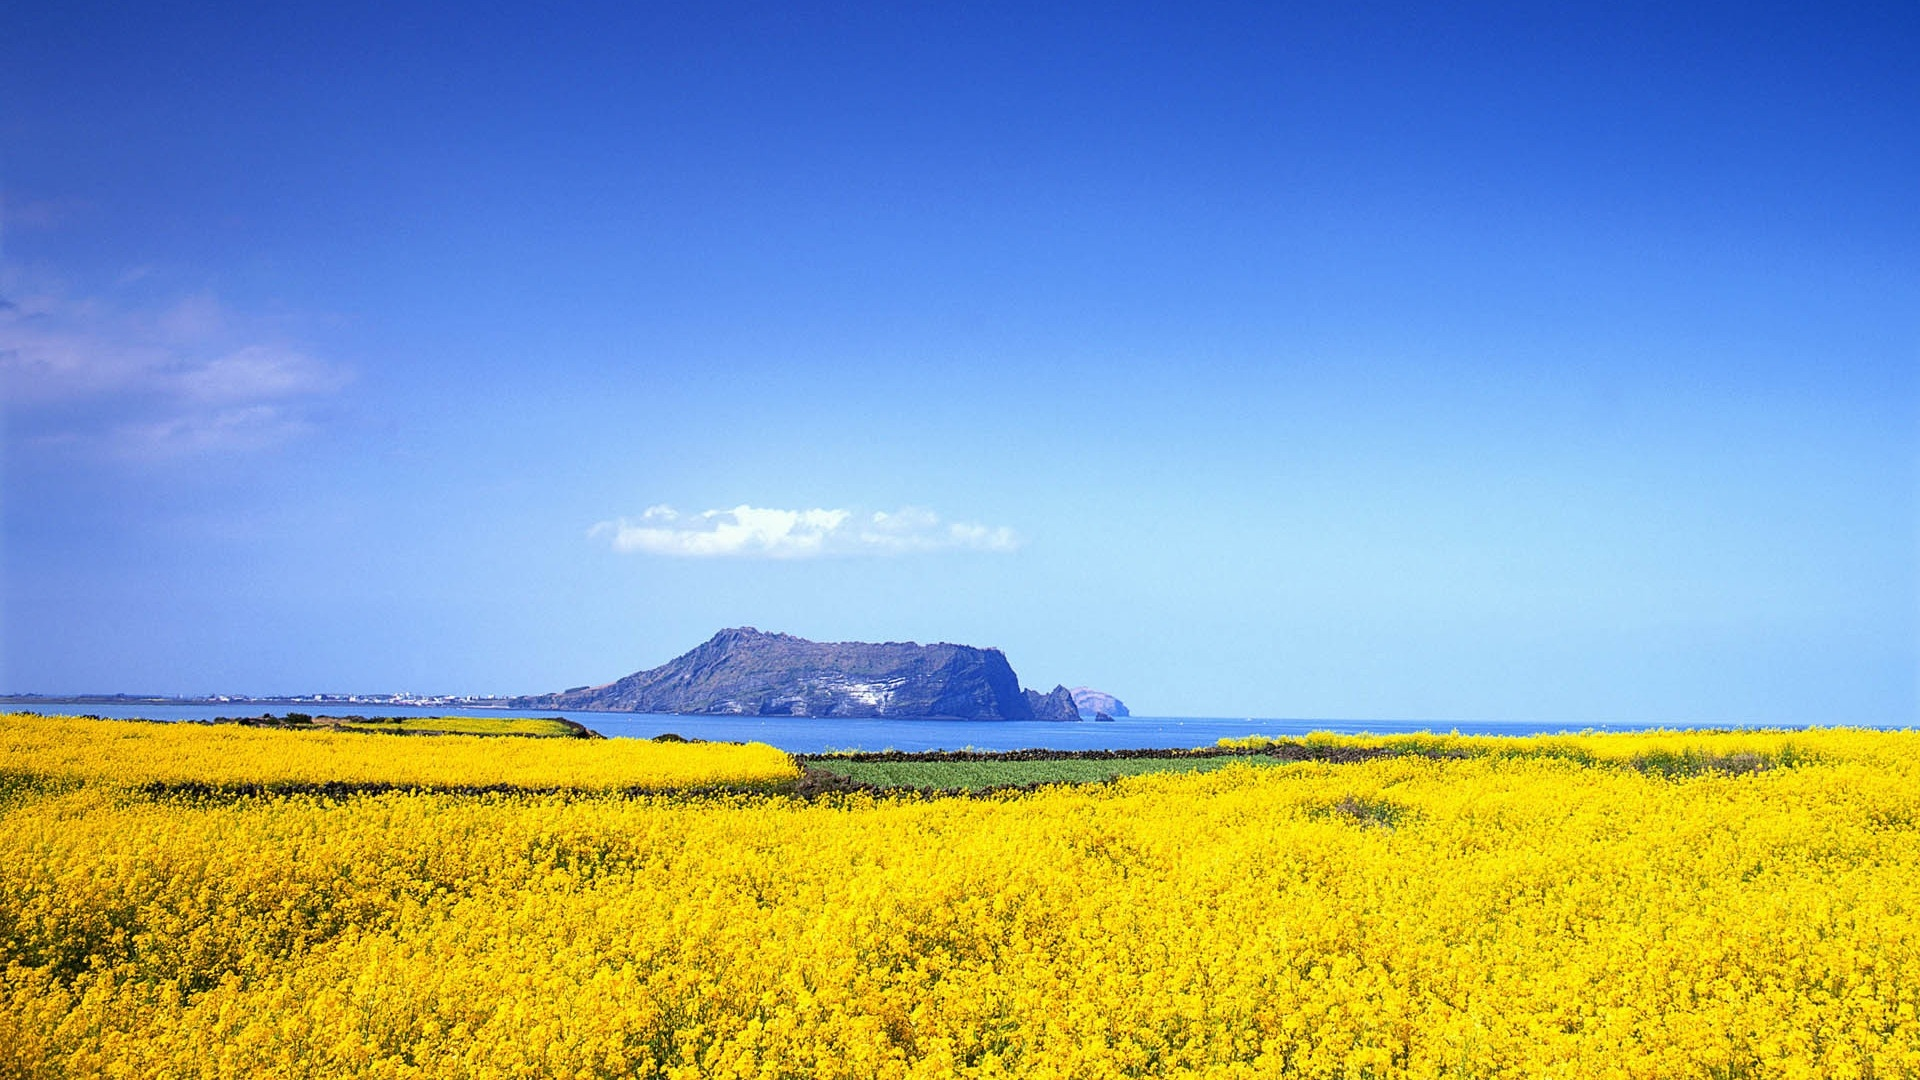 Yellow Nature best background